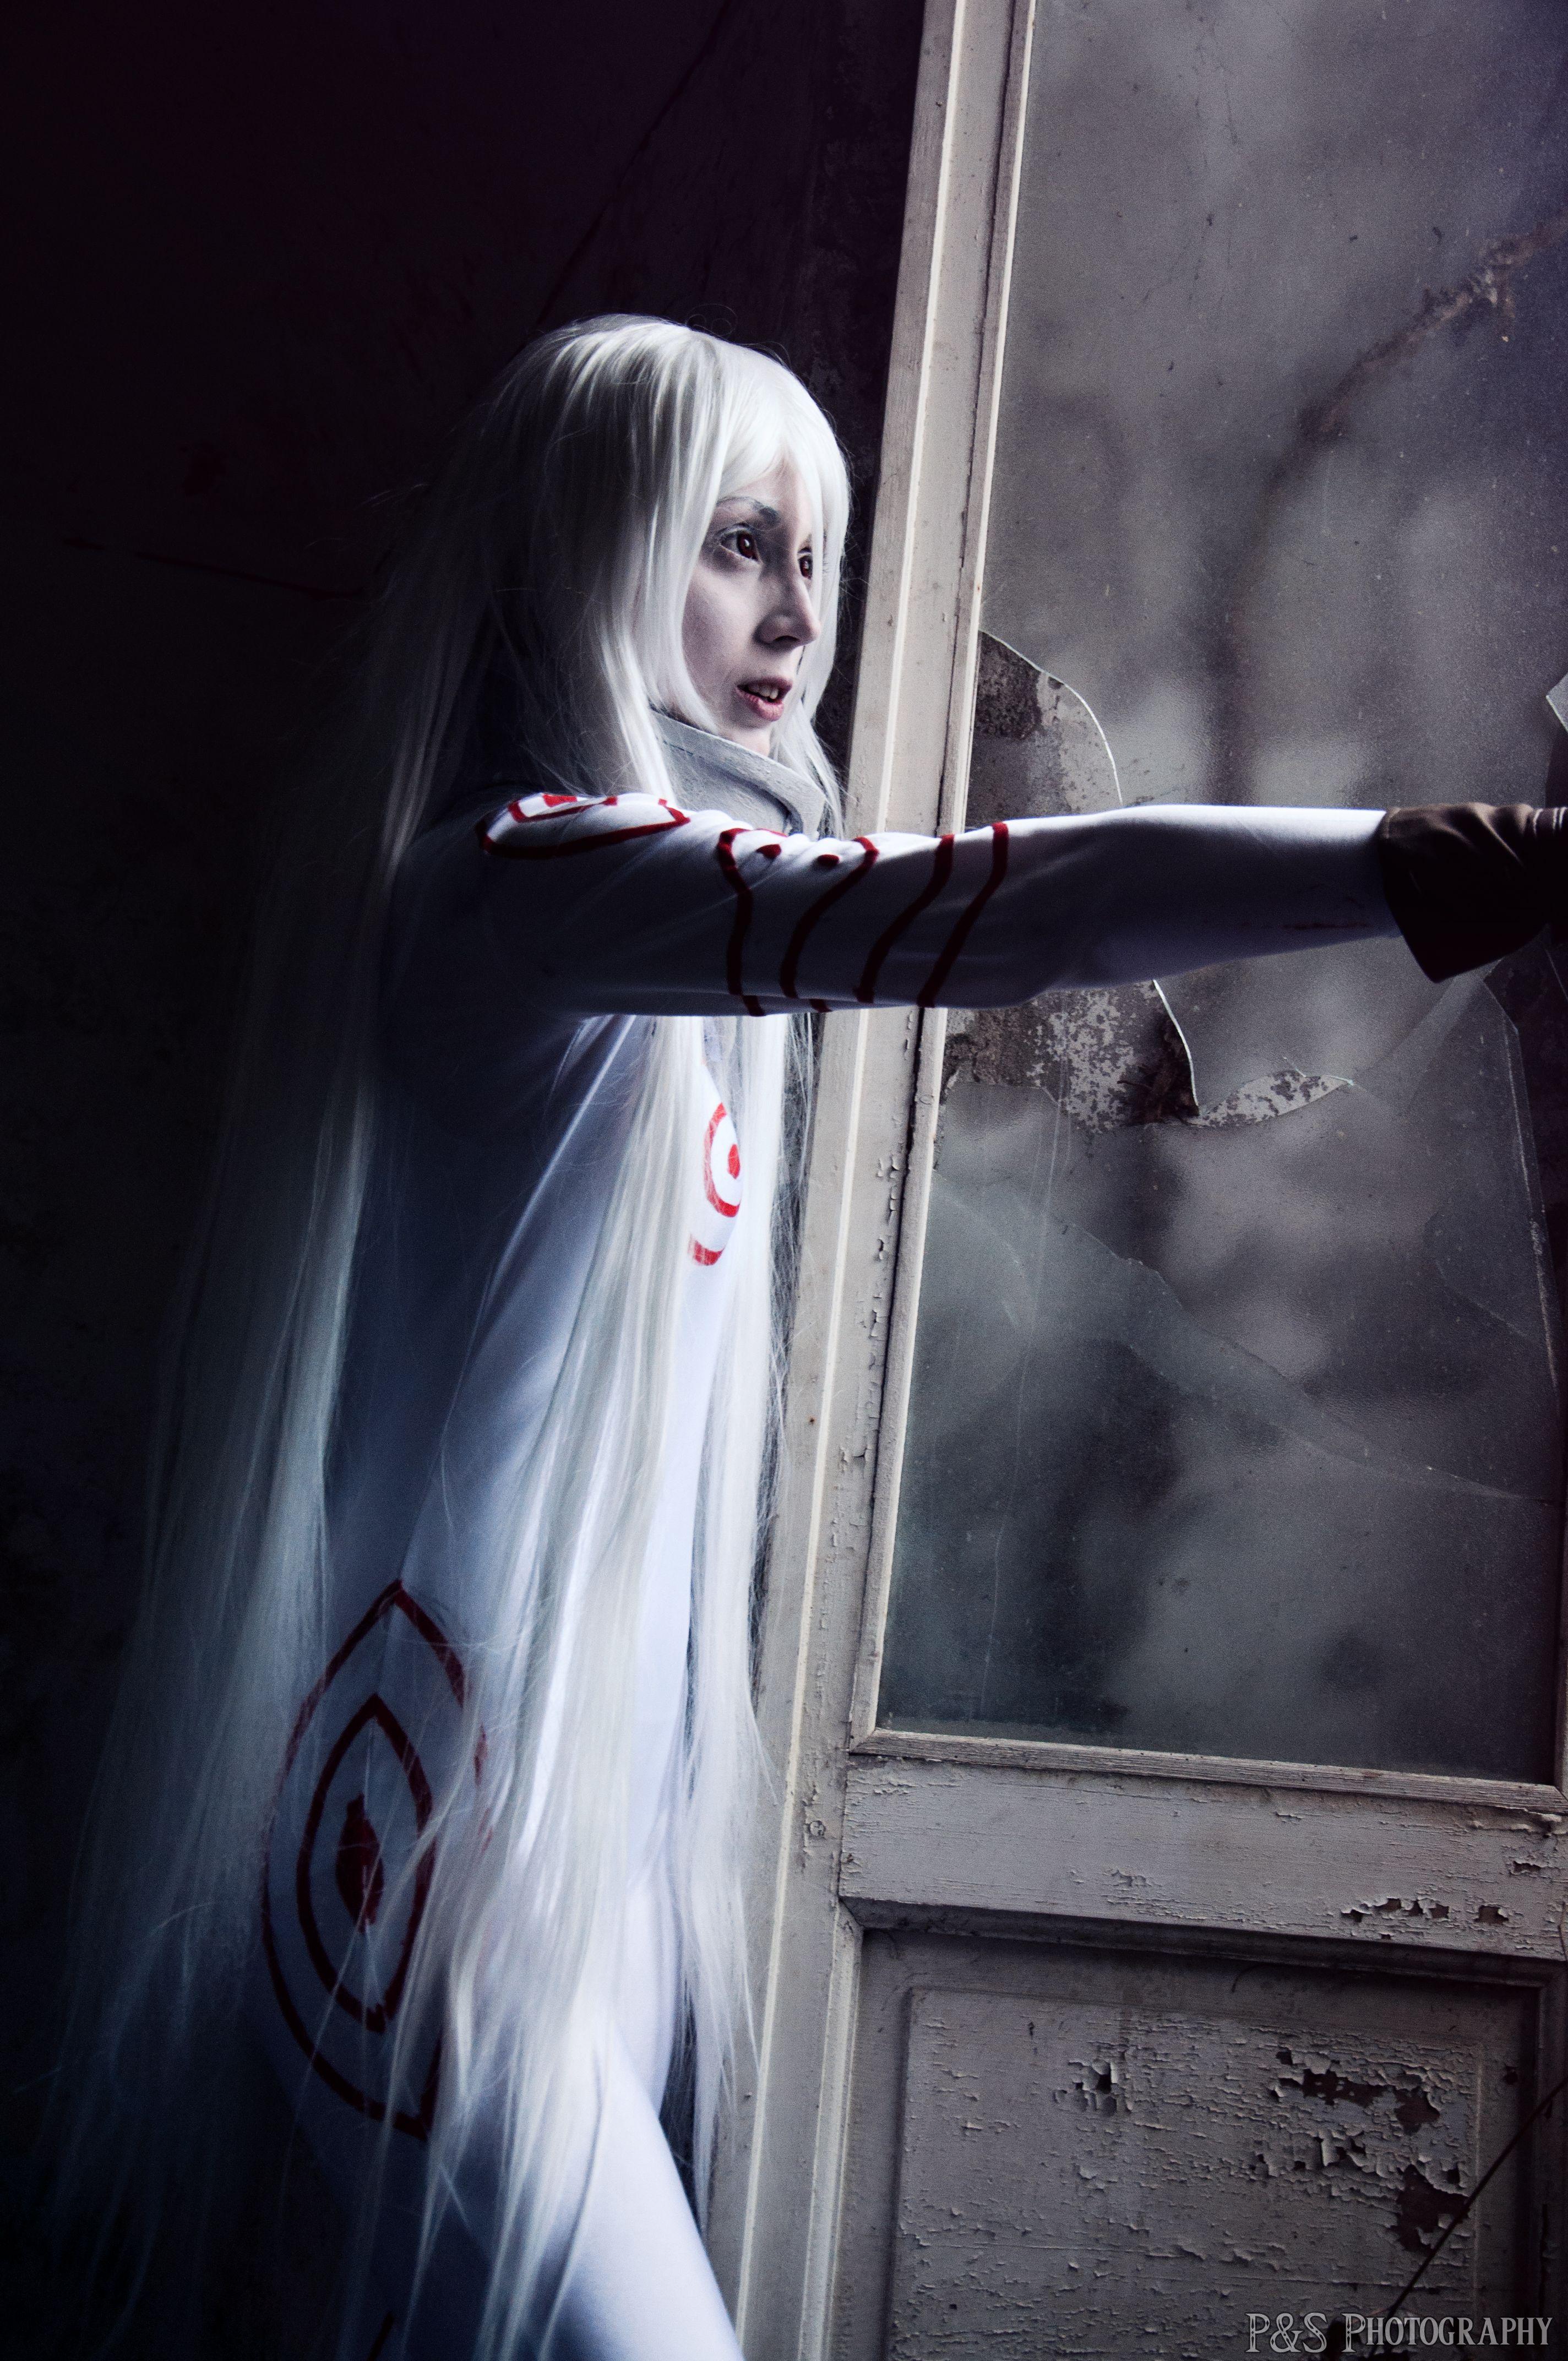 Shiro cosplay as Shiro from Deadman Wonderland © P&S